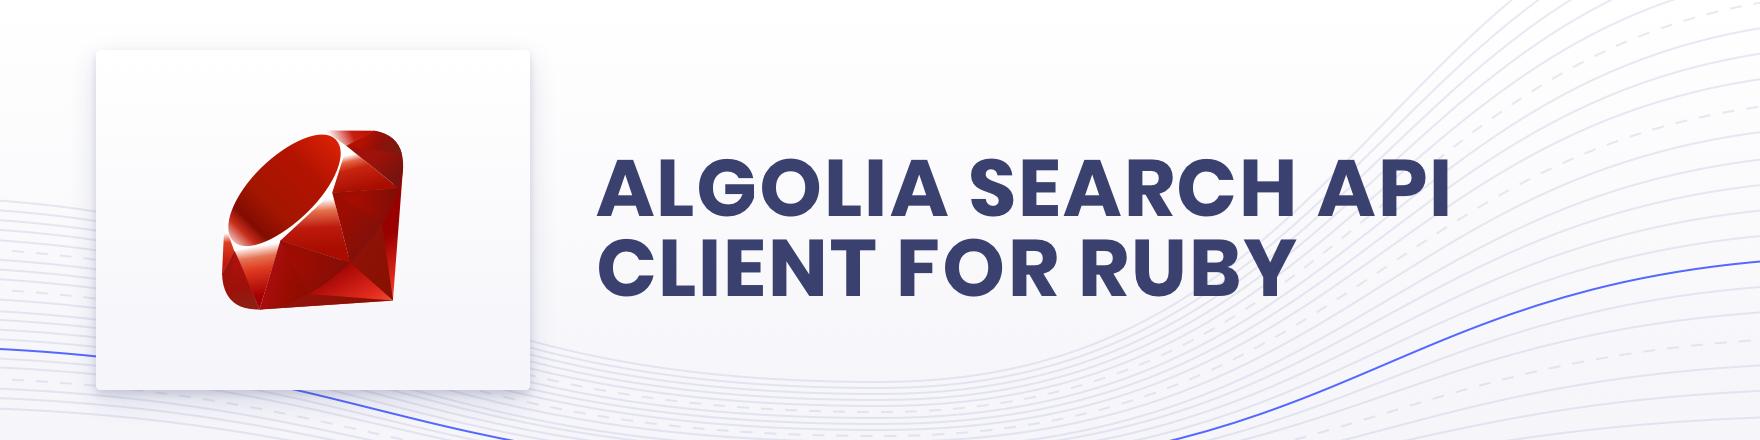 Algolia for Ruby